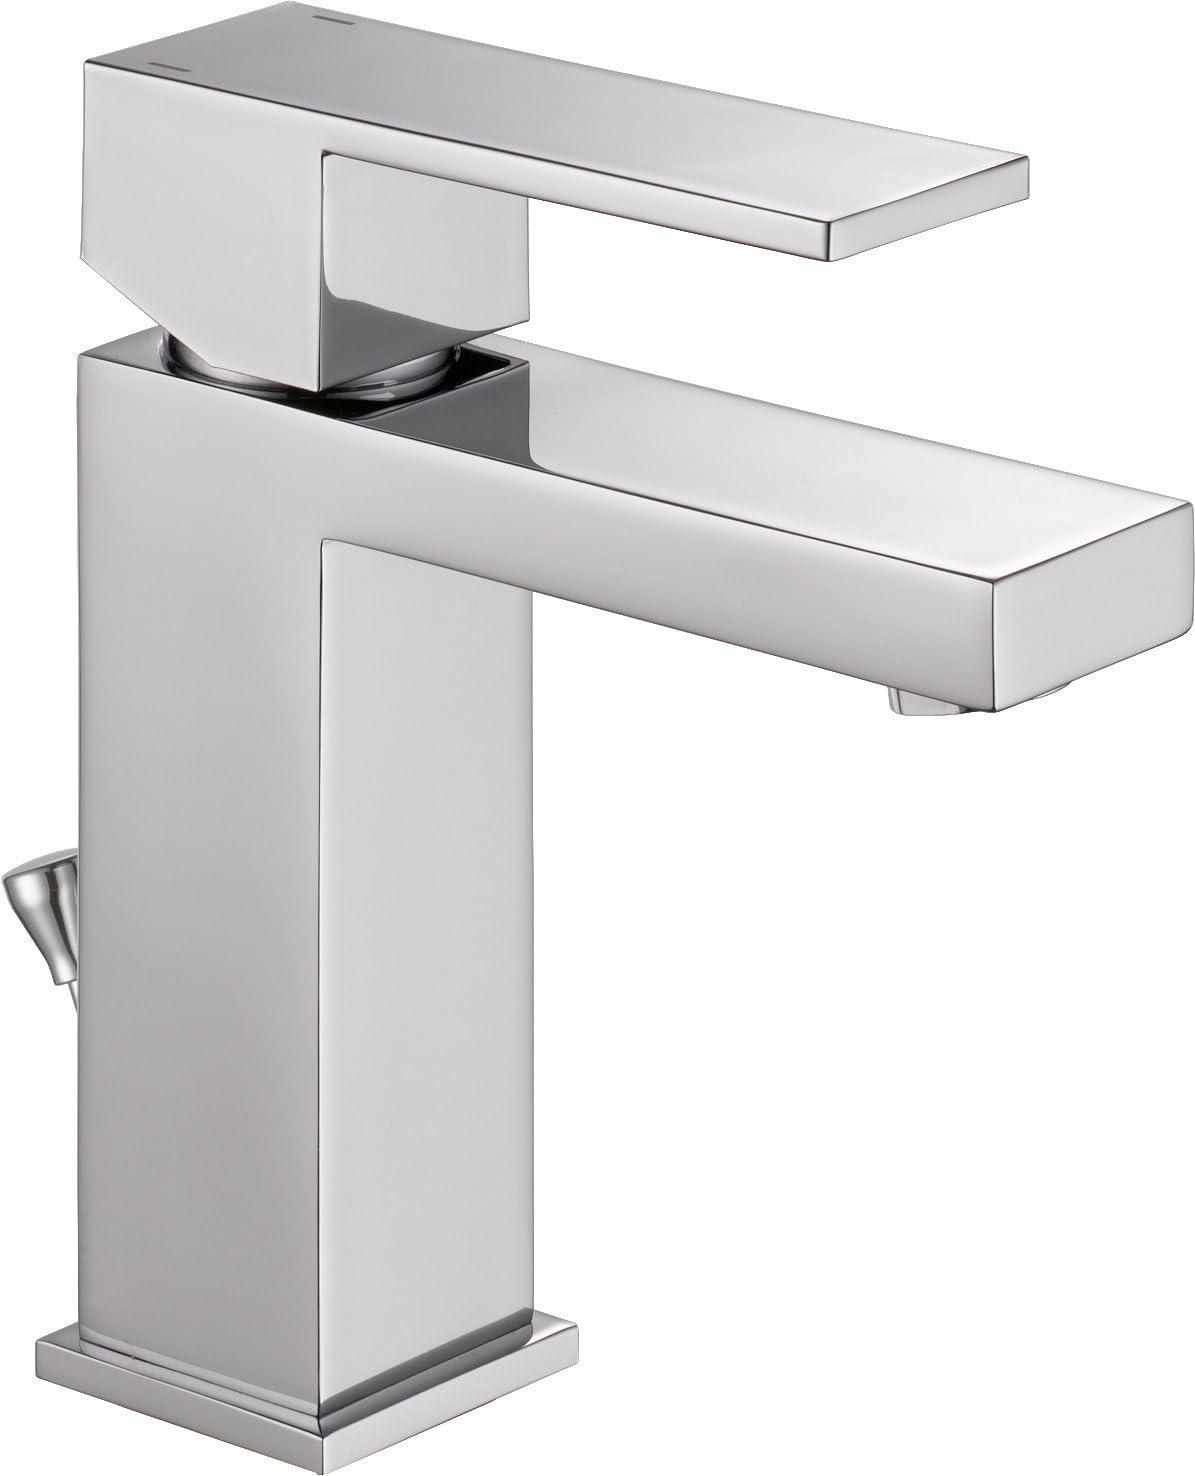 9. Angular Modern Single Handle Lavatory Faucet